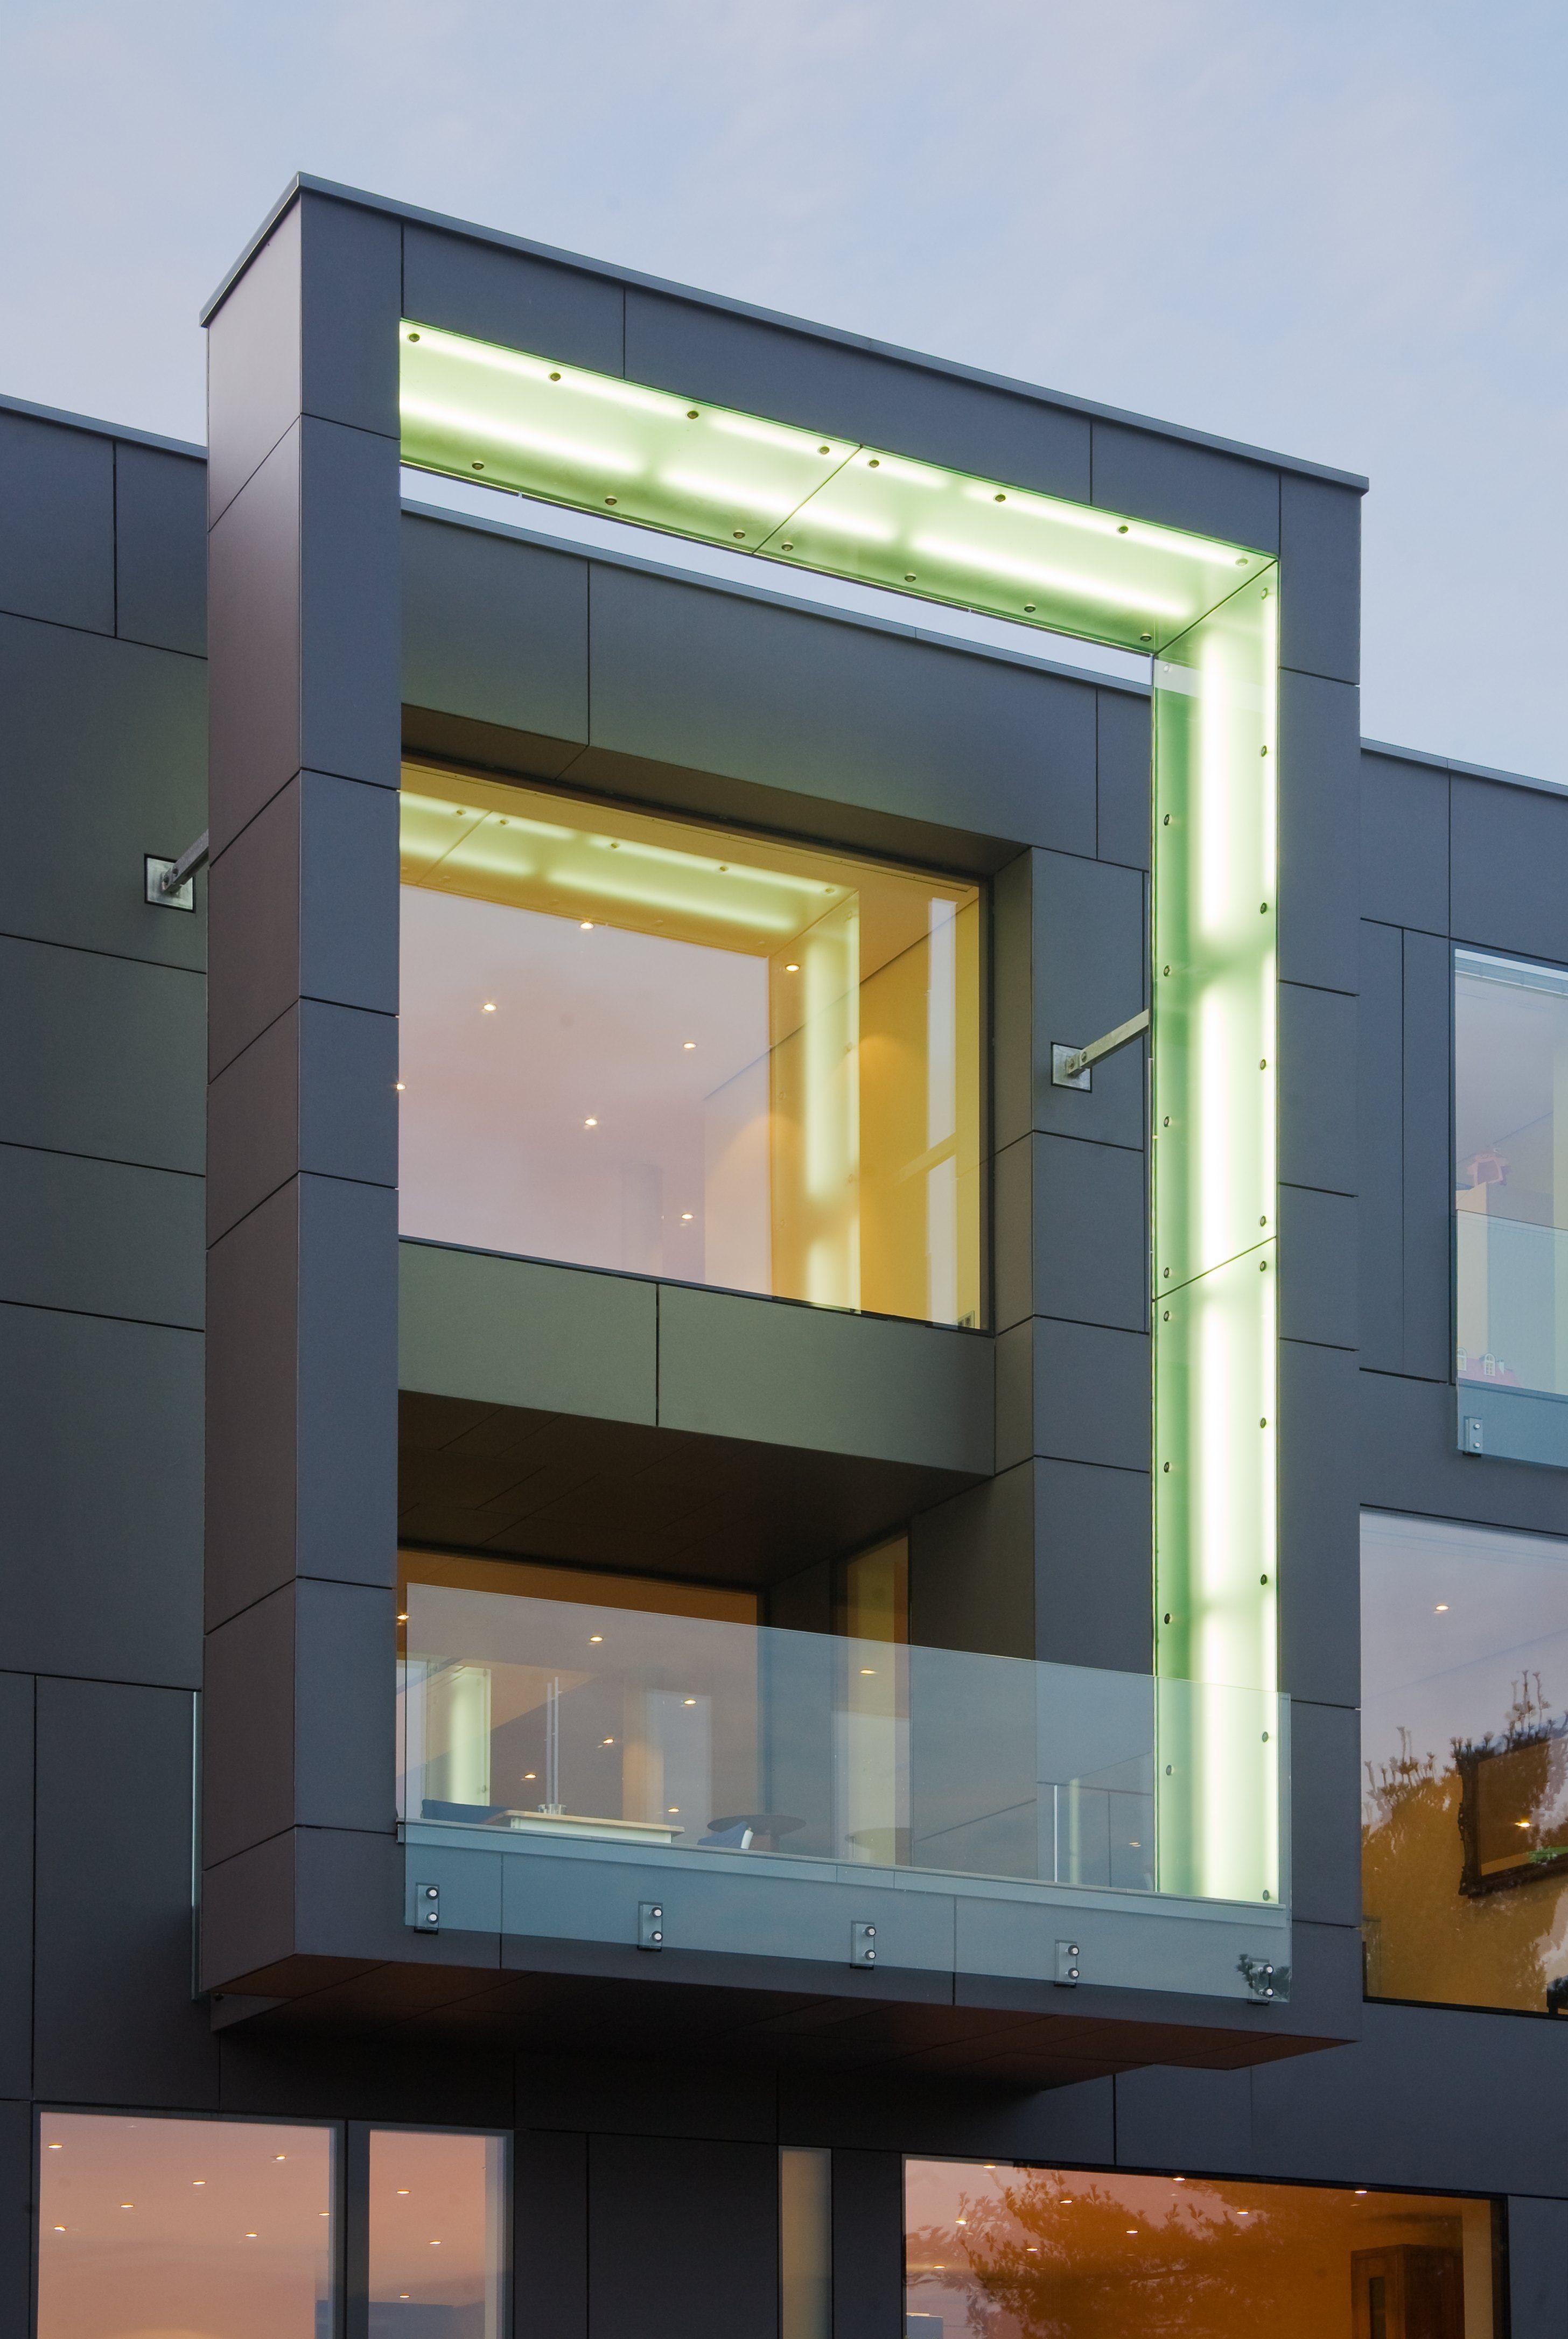 Modern villa in dortmund by drp baukunst equitone facade for Facade moderne villa